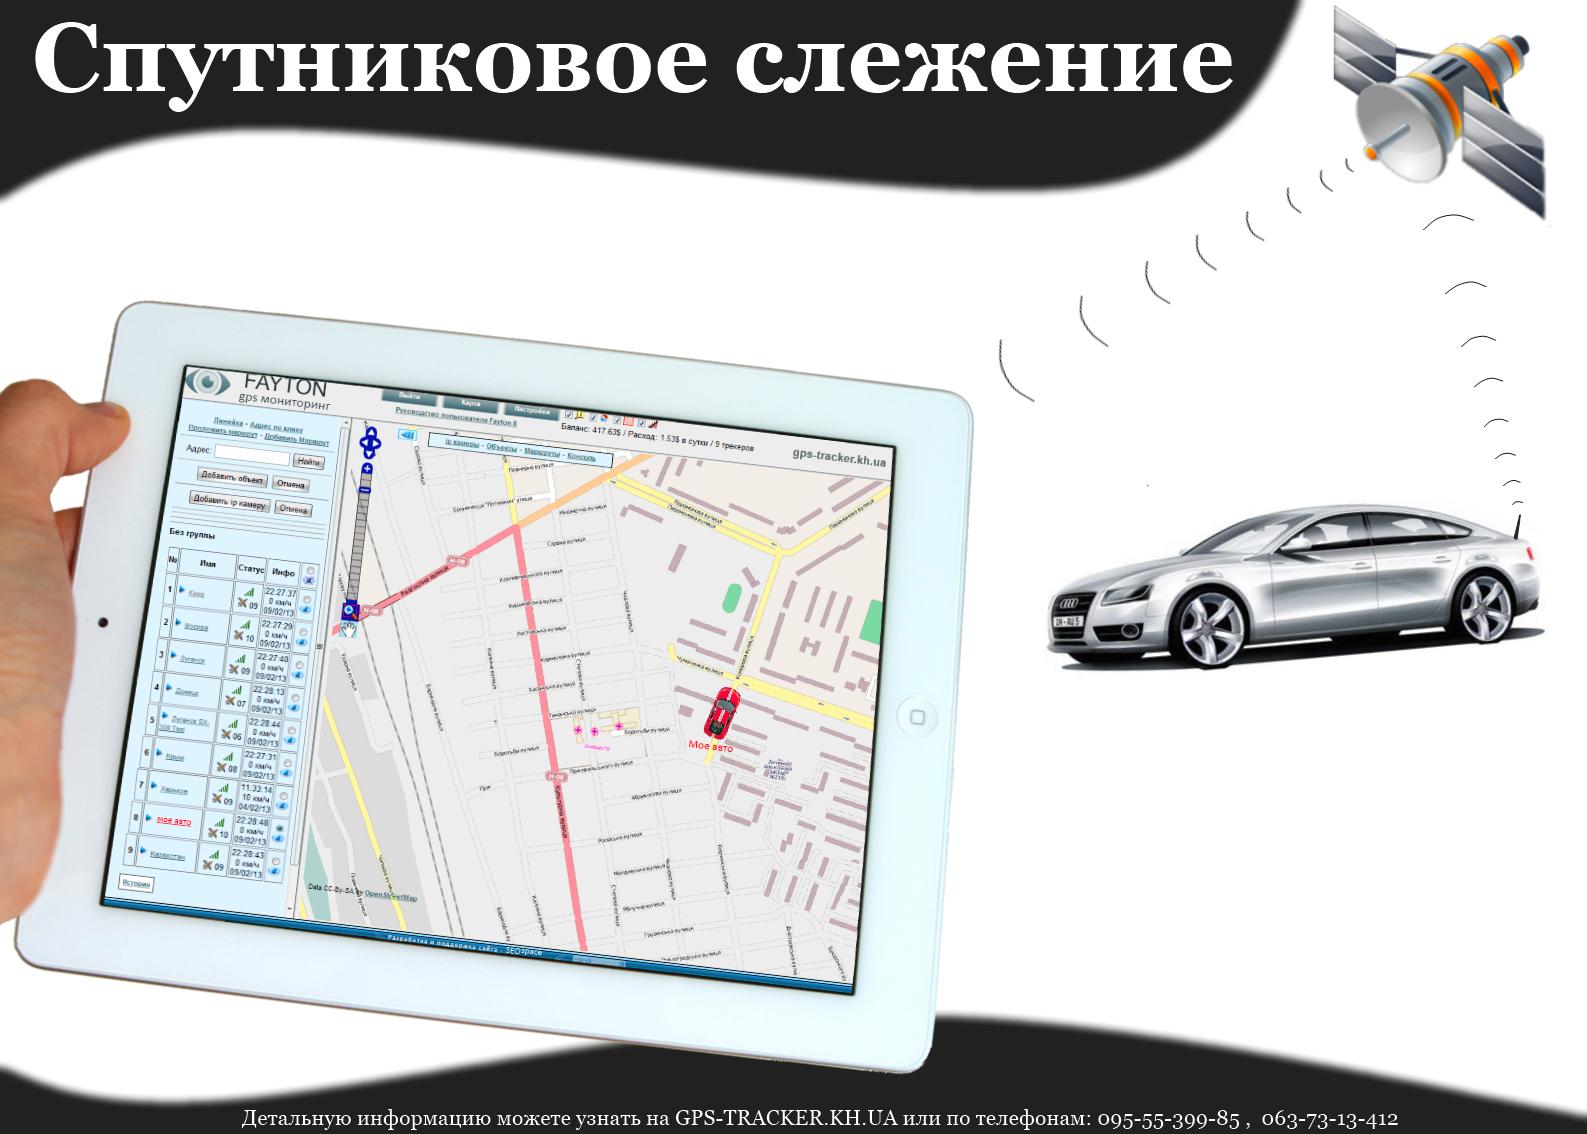 Система слежения за автомобилем